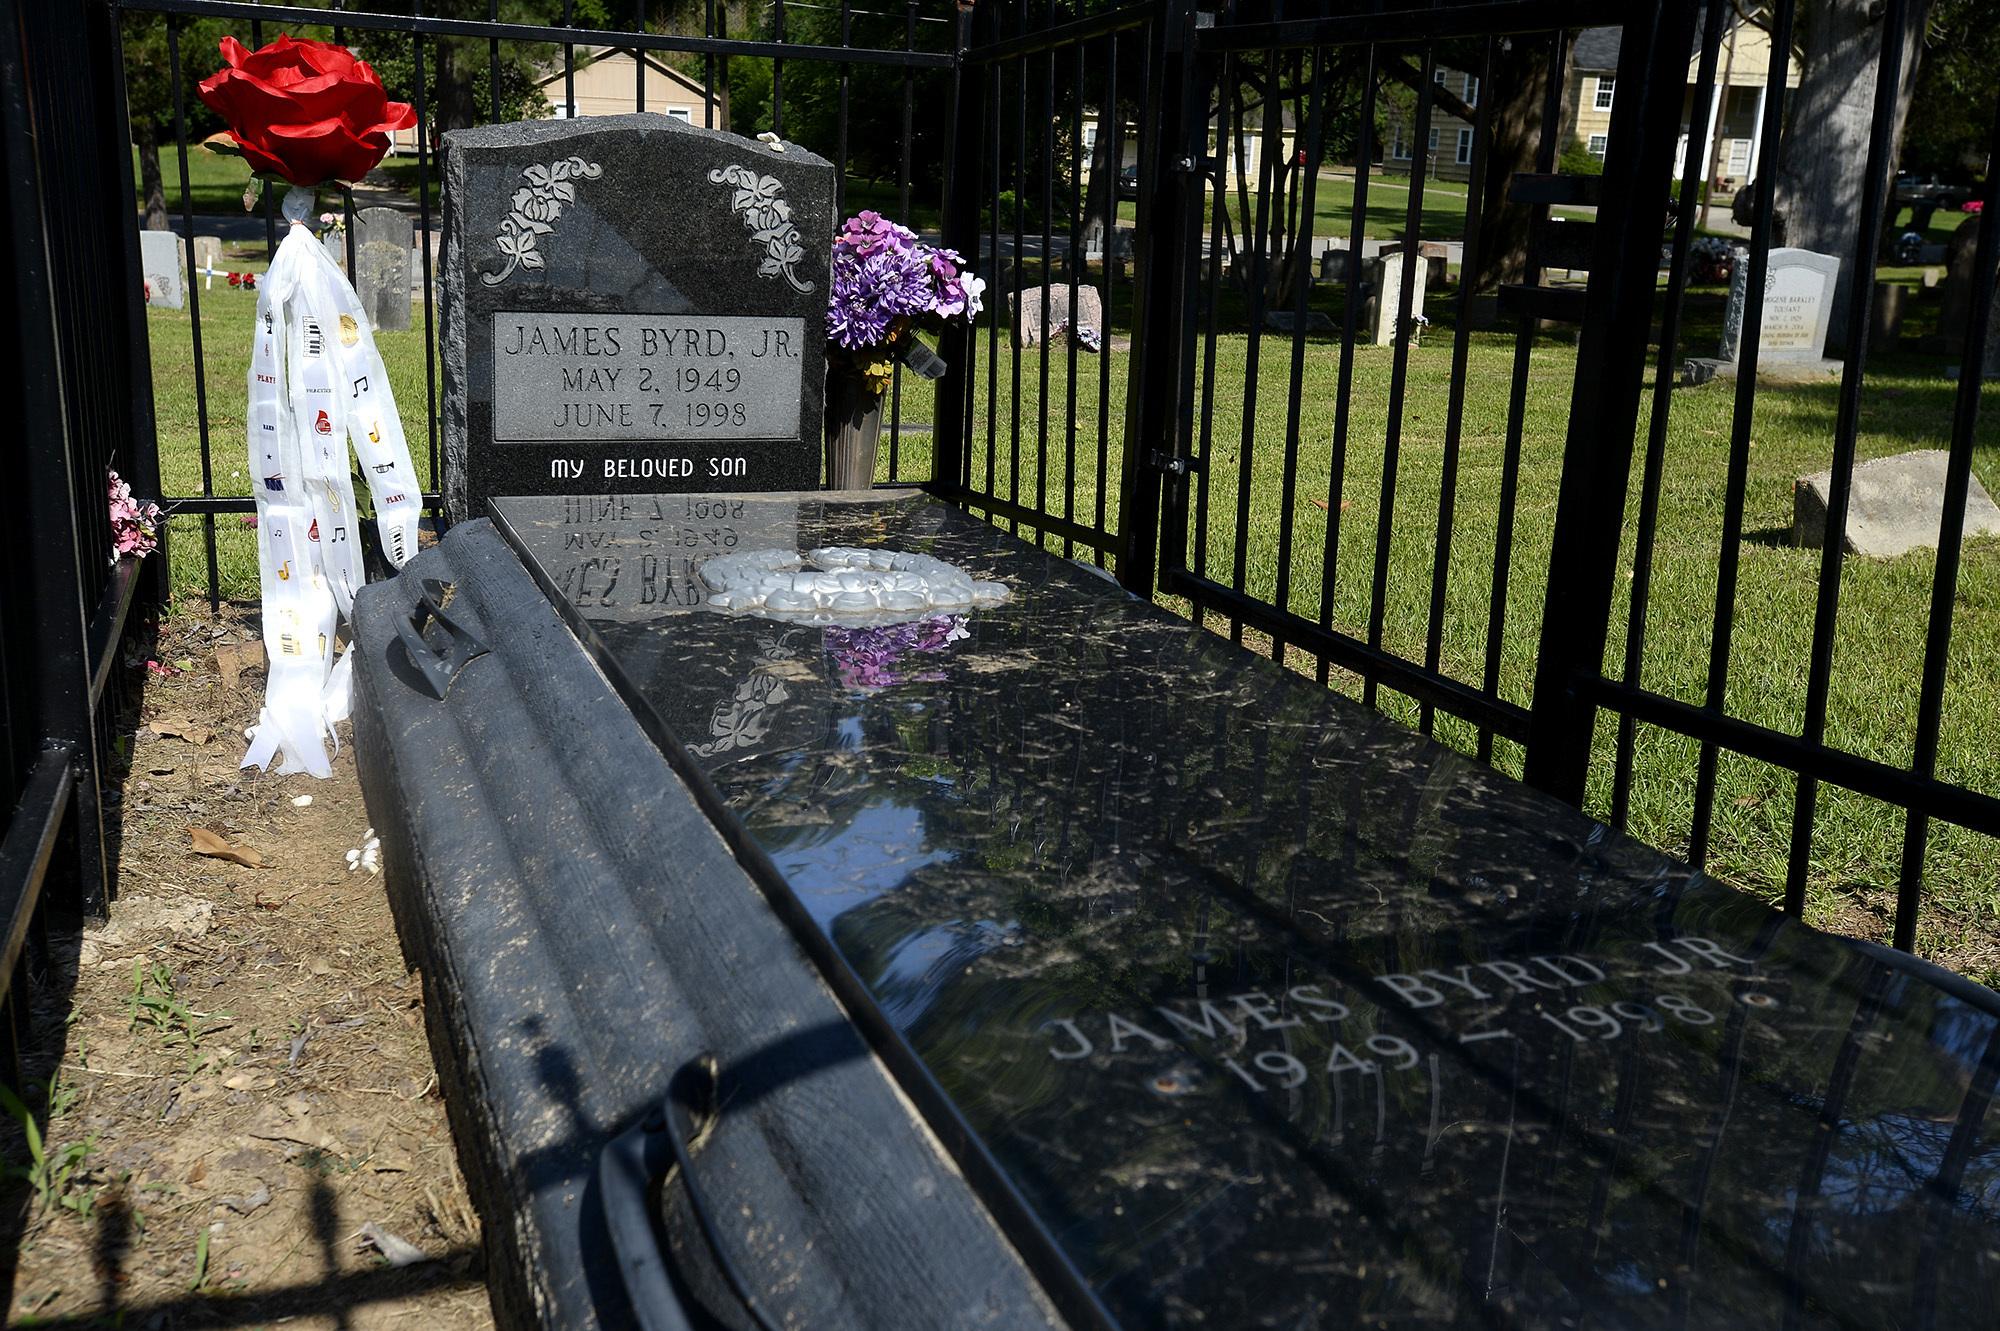 James Byrd Jr Cemetery